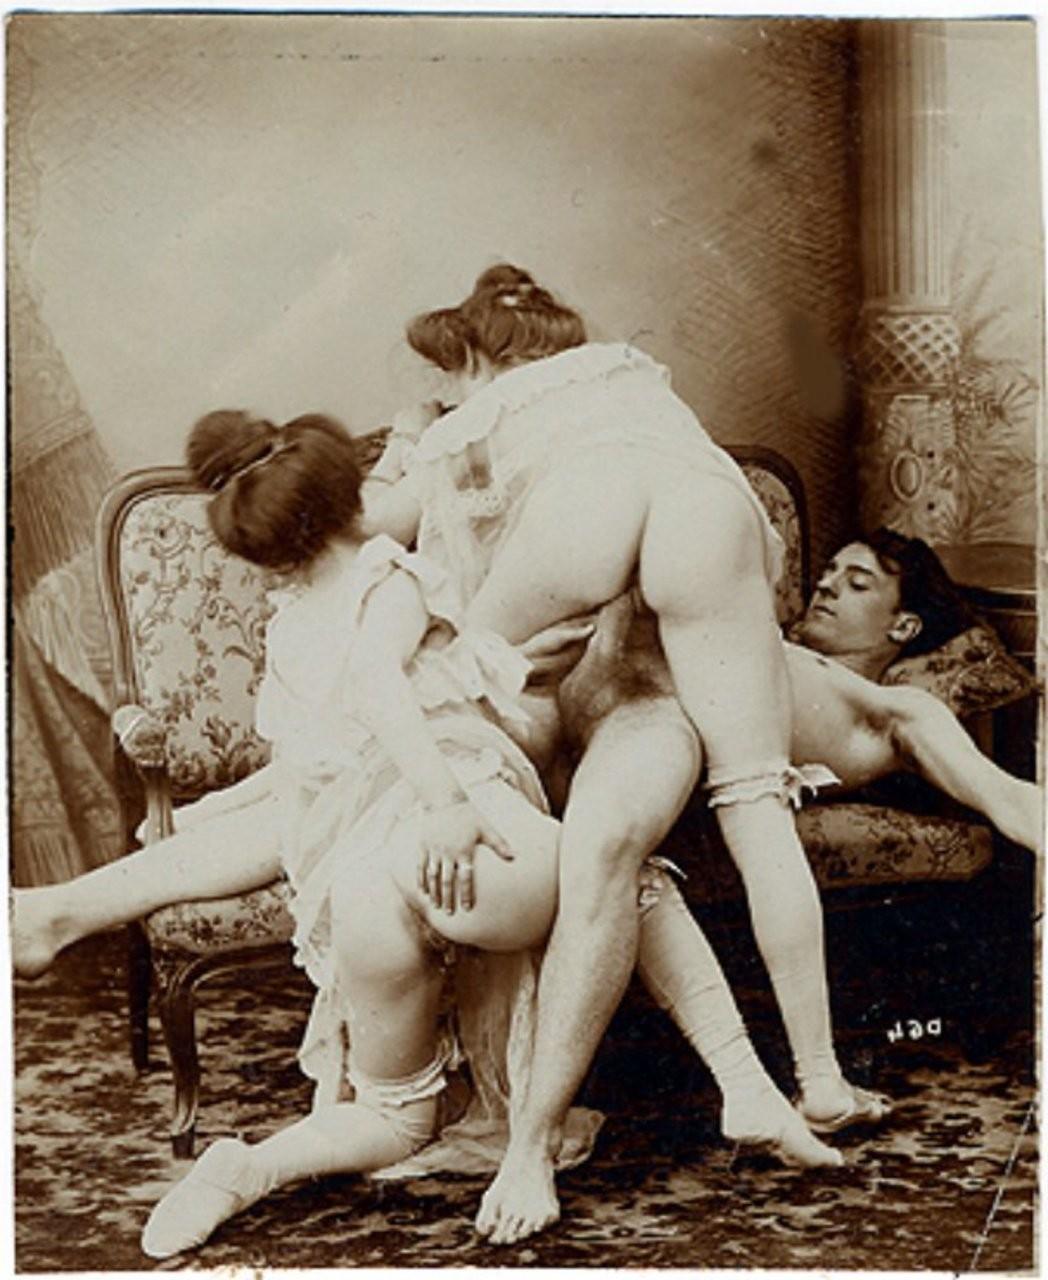 de succion pipe – Erotisch